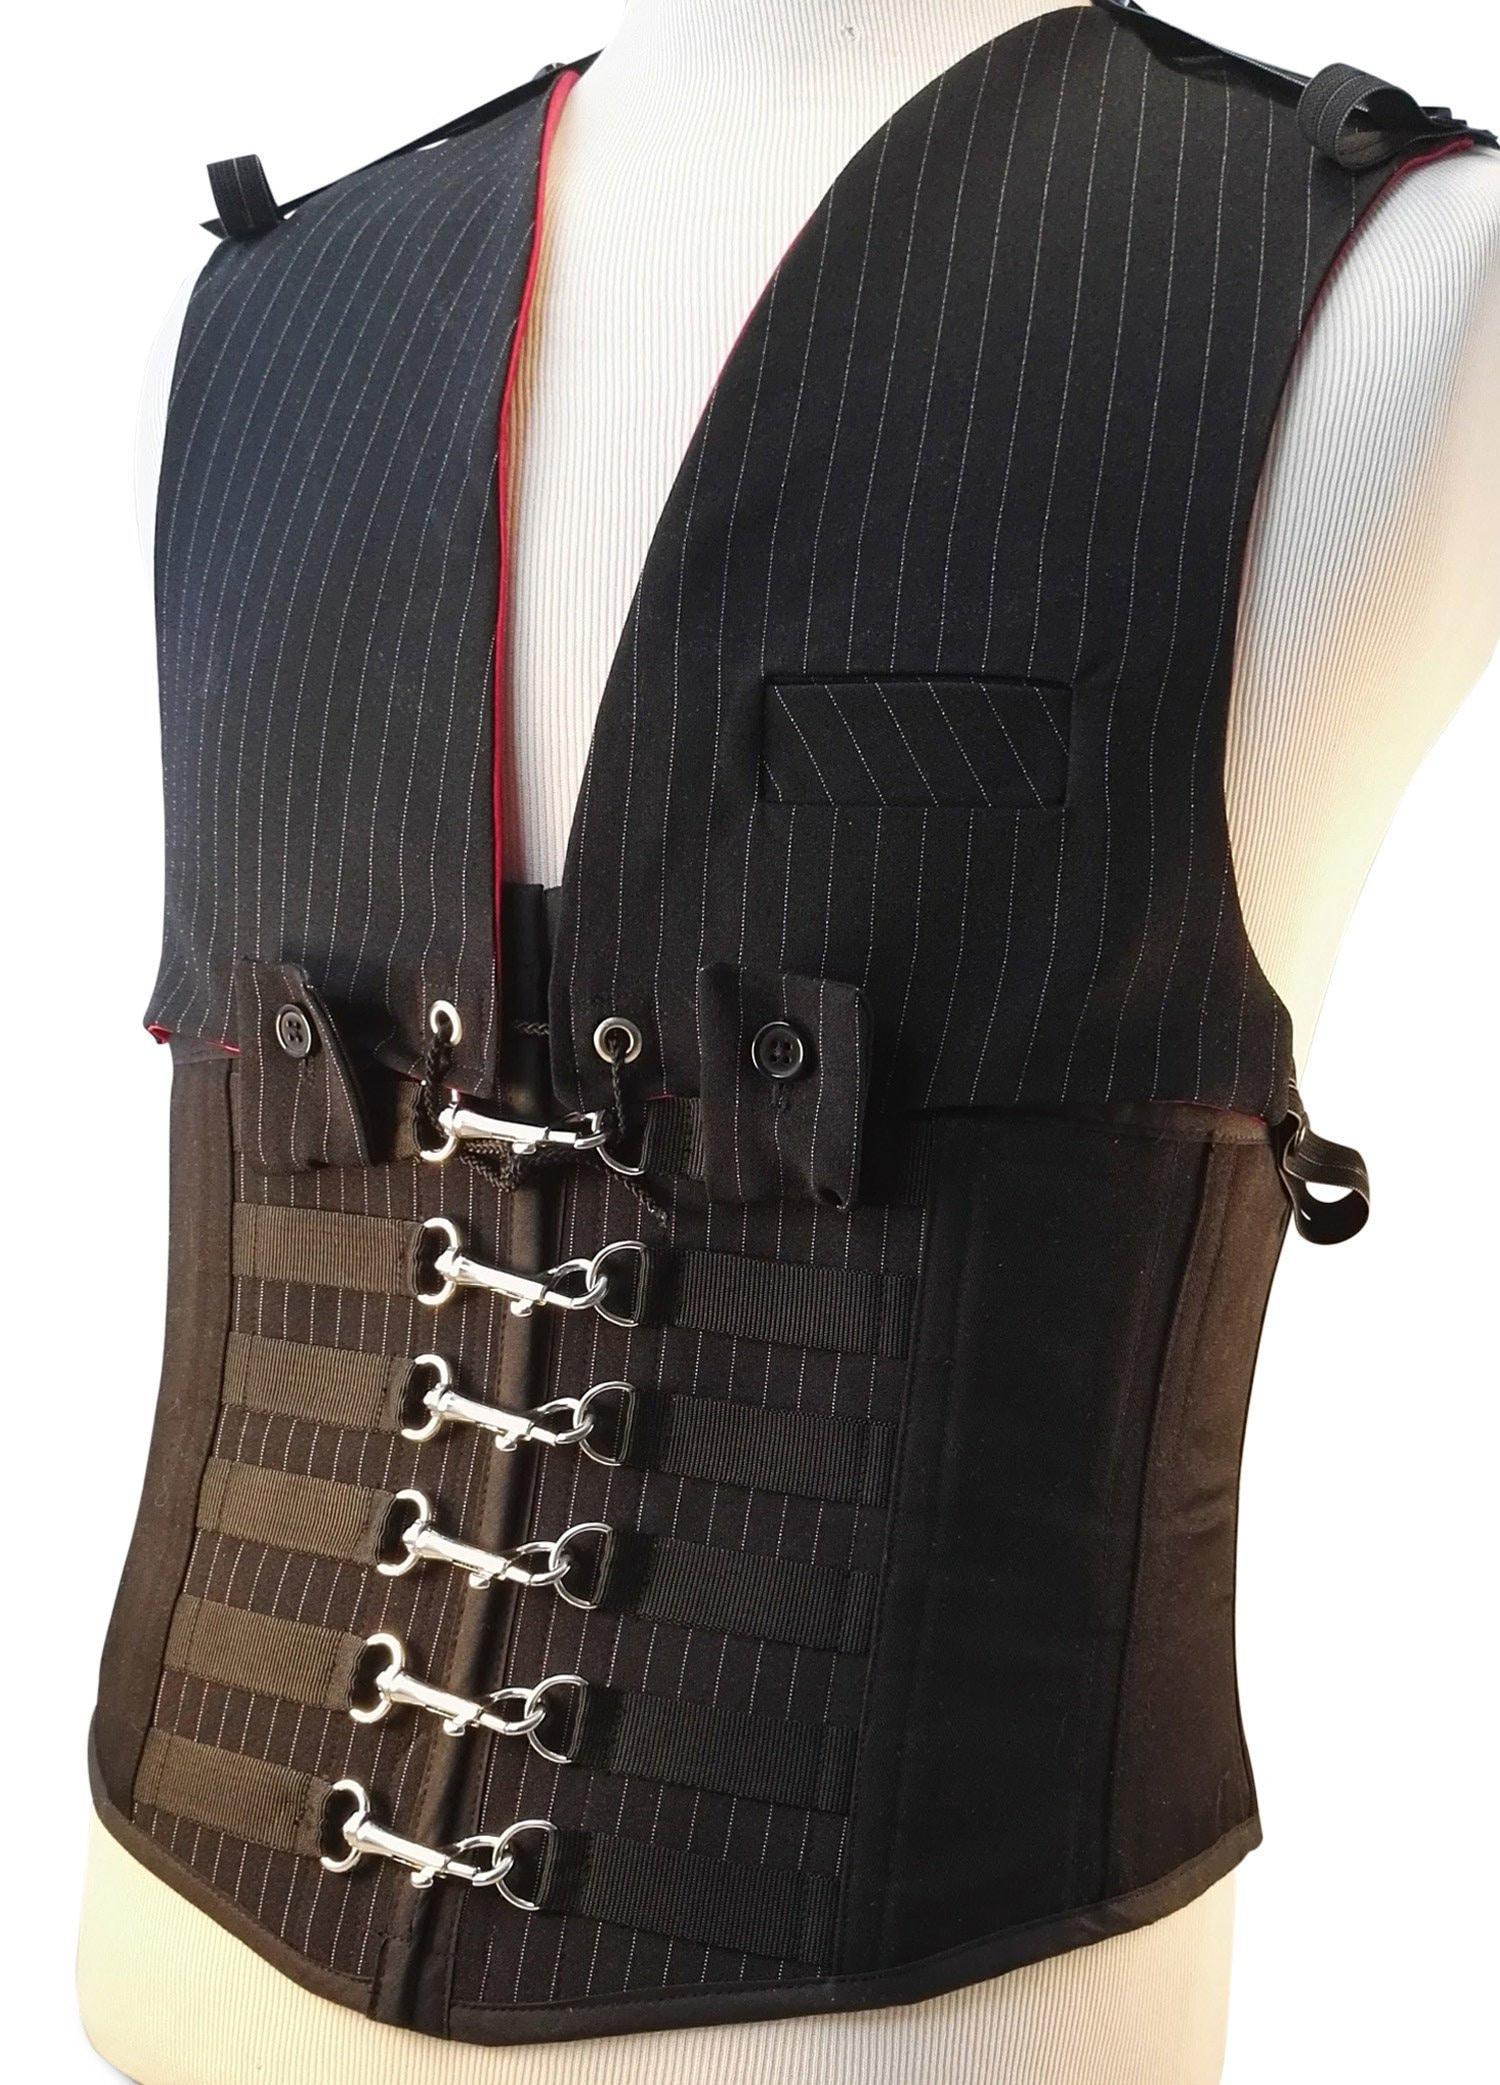 c841f25e4 SteelBoned Underbust Corset in Leather CS411Iquotve heard that